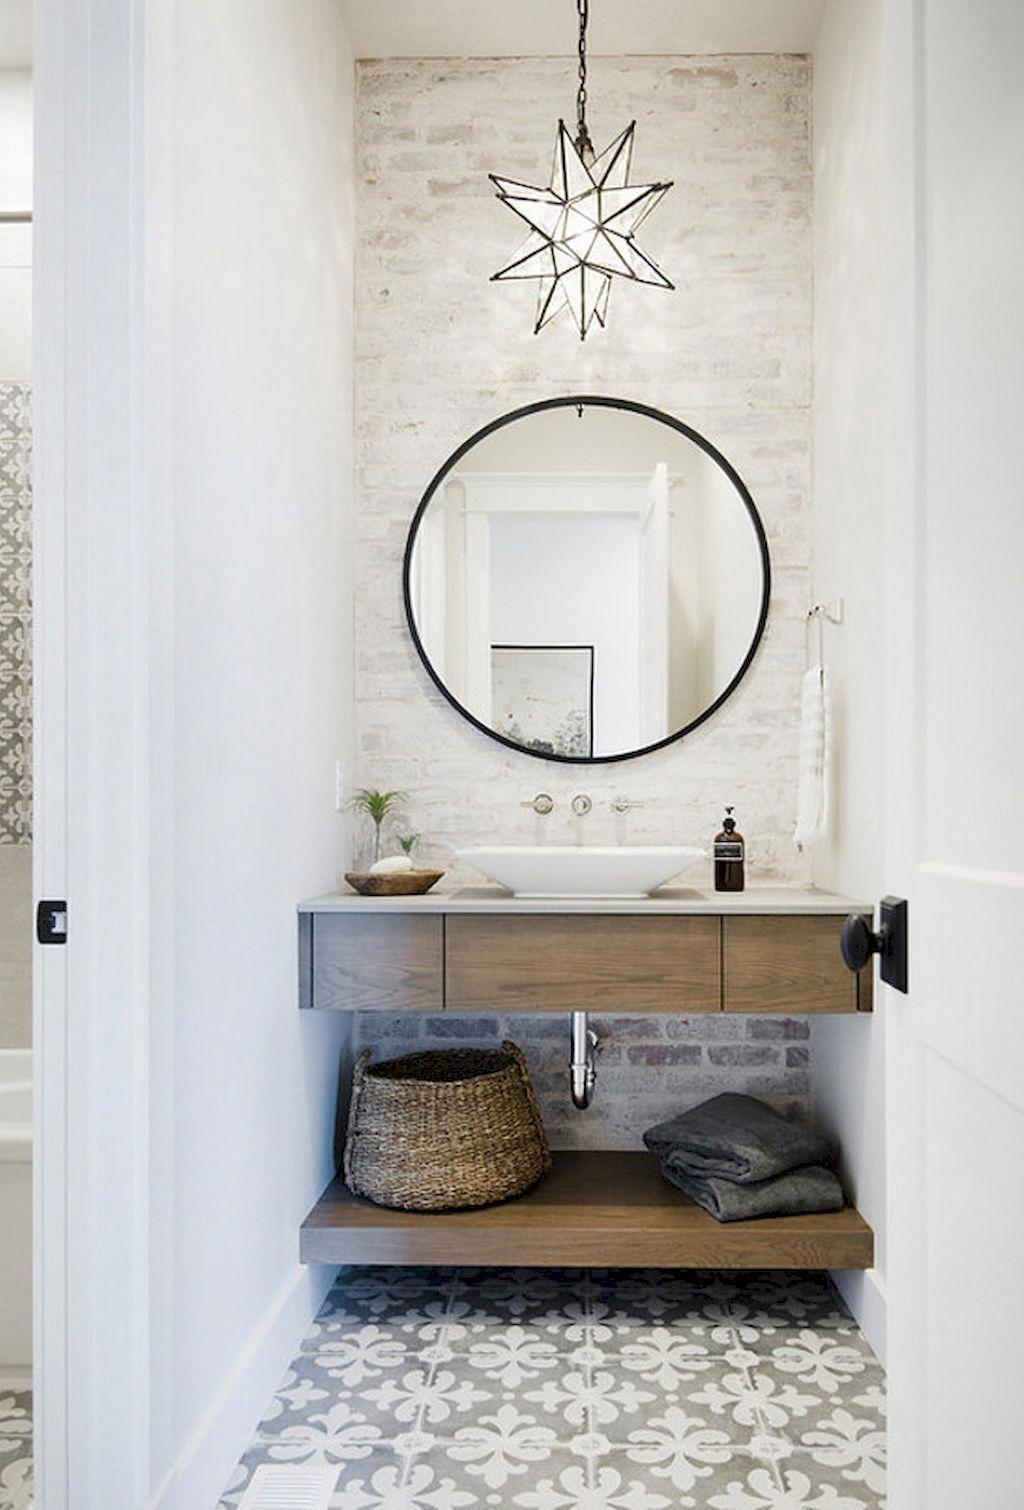 47 Romantic Farmhouse Bathroom Vanity Ideas # ... on Rustic Farmhouse Bathroom Tile  id=26239